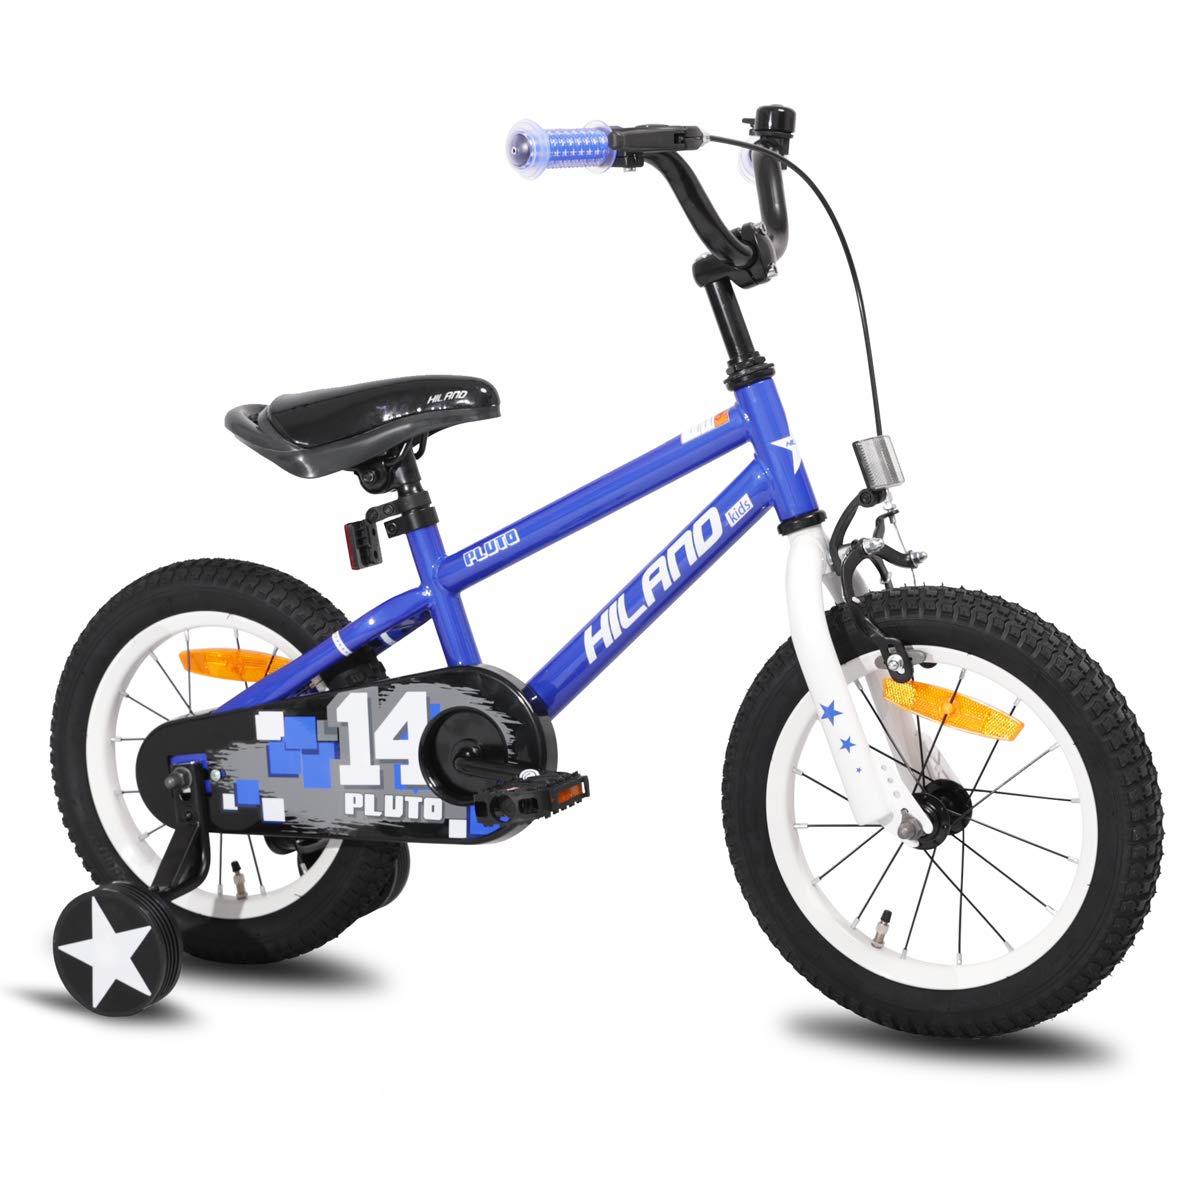 HILAND Pluto - Bicicleta infantil de 3 a 6 años, con ruedas de ...